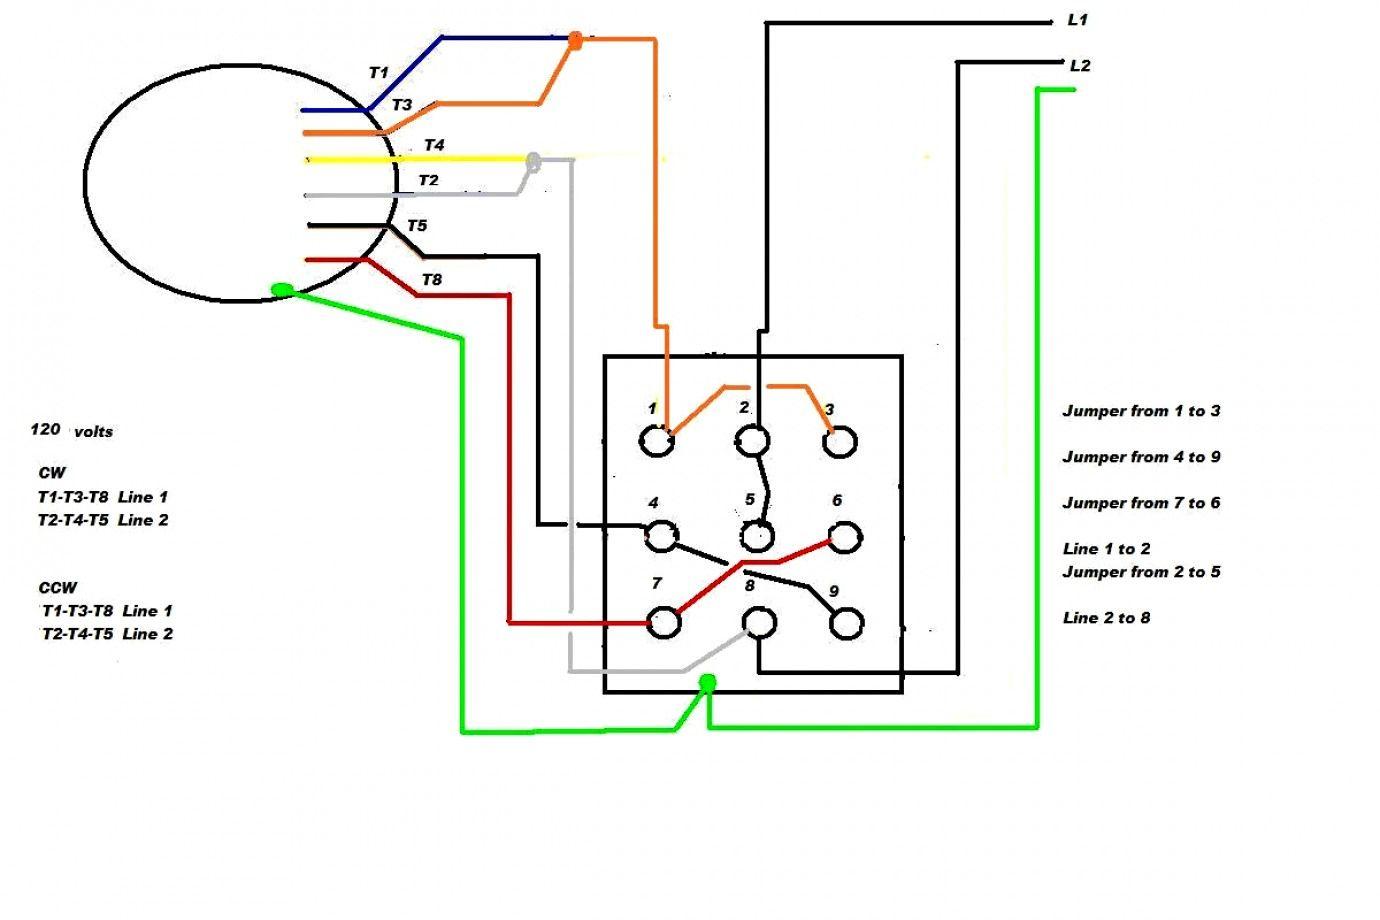 medium resolution of single phase wiring diagram for house wiring diagram diagram marathon electric 3 phase wiring diagram